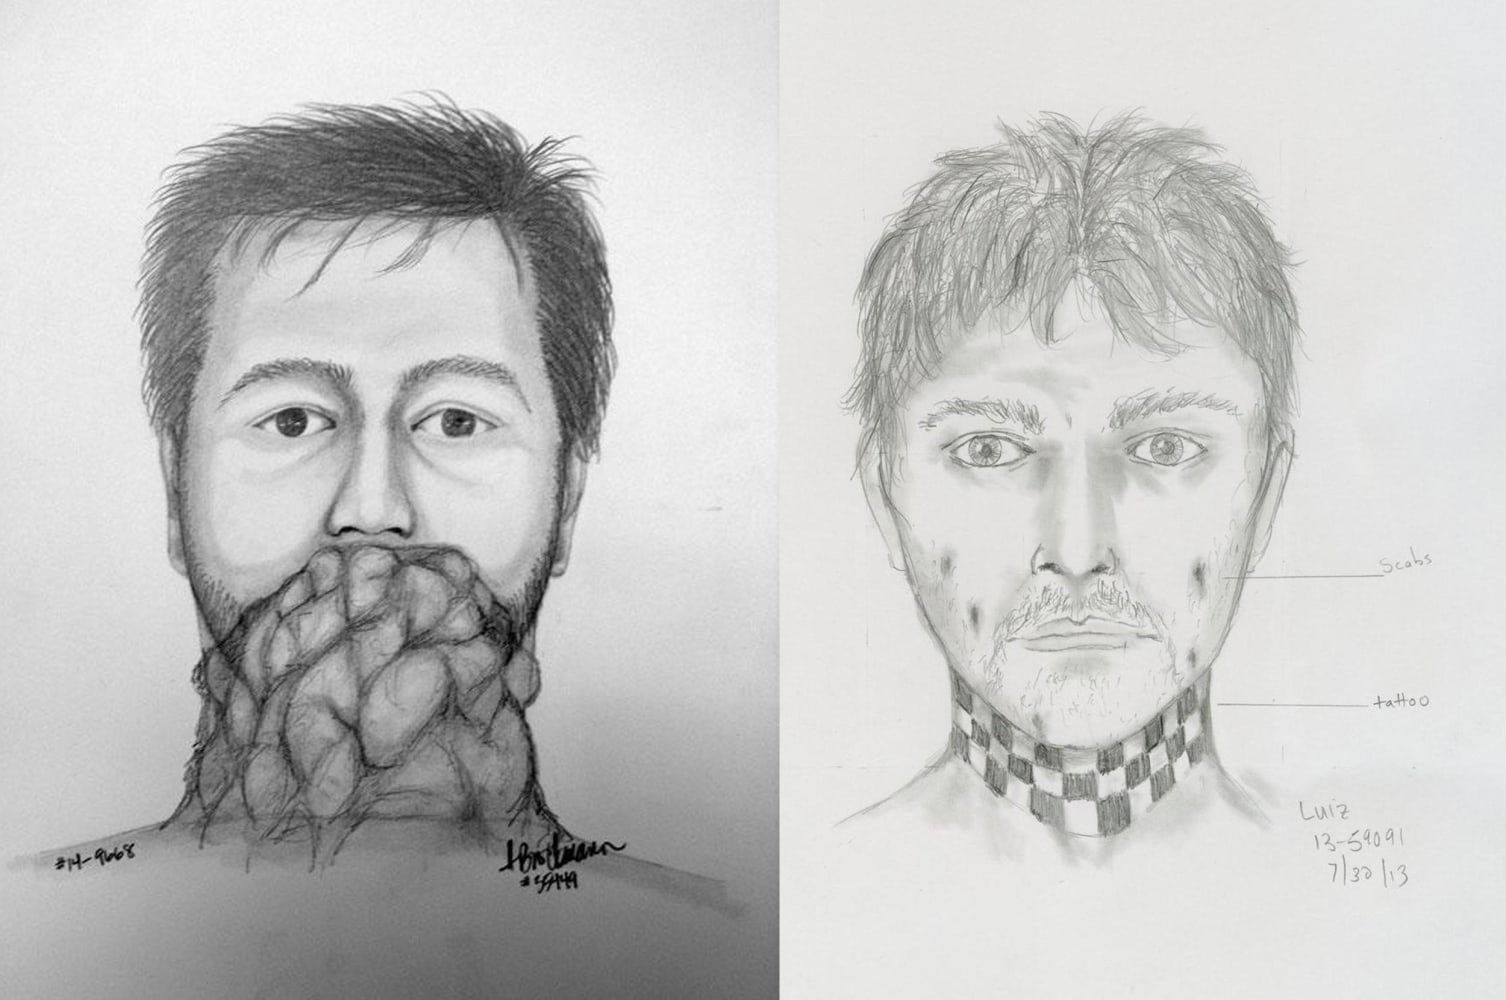 dying art u0027 forensic sketch artists face a digital future nbc news